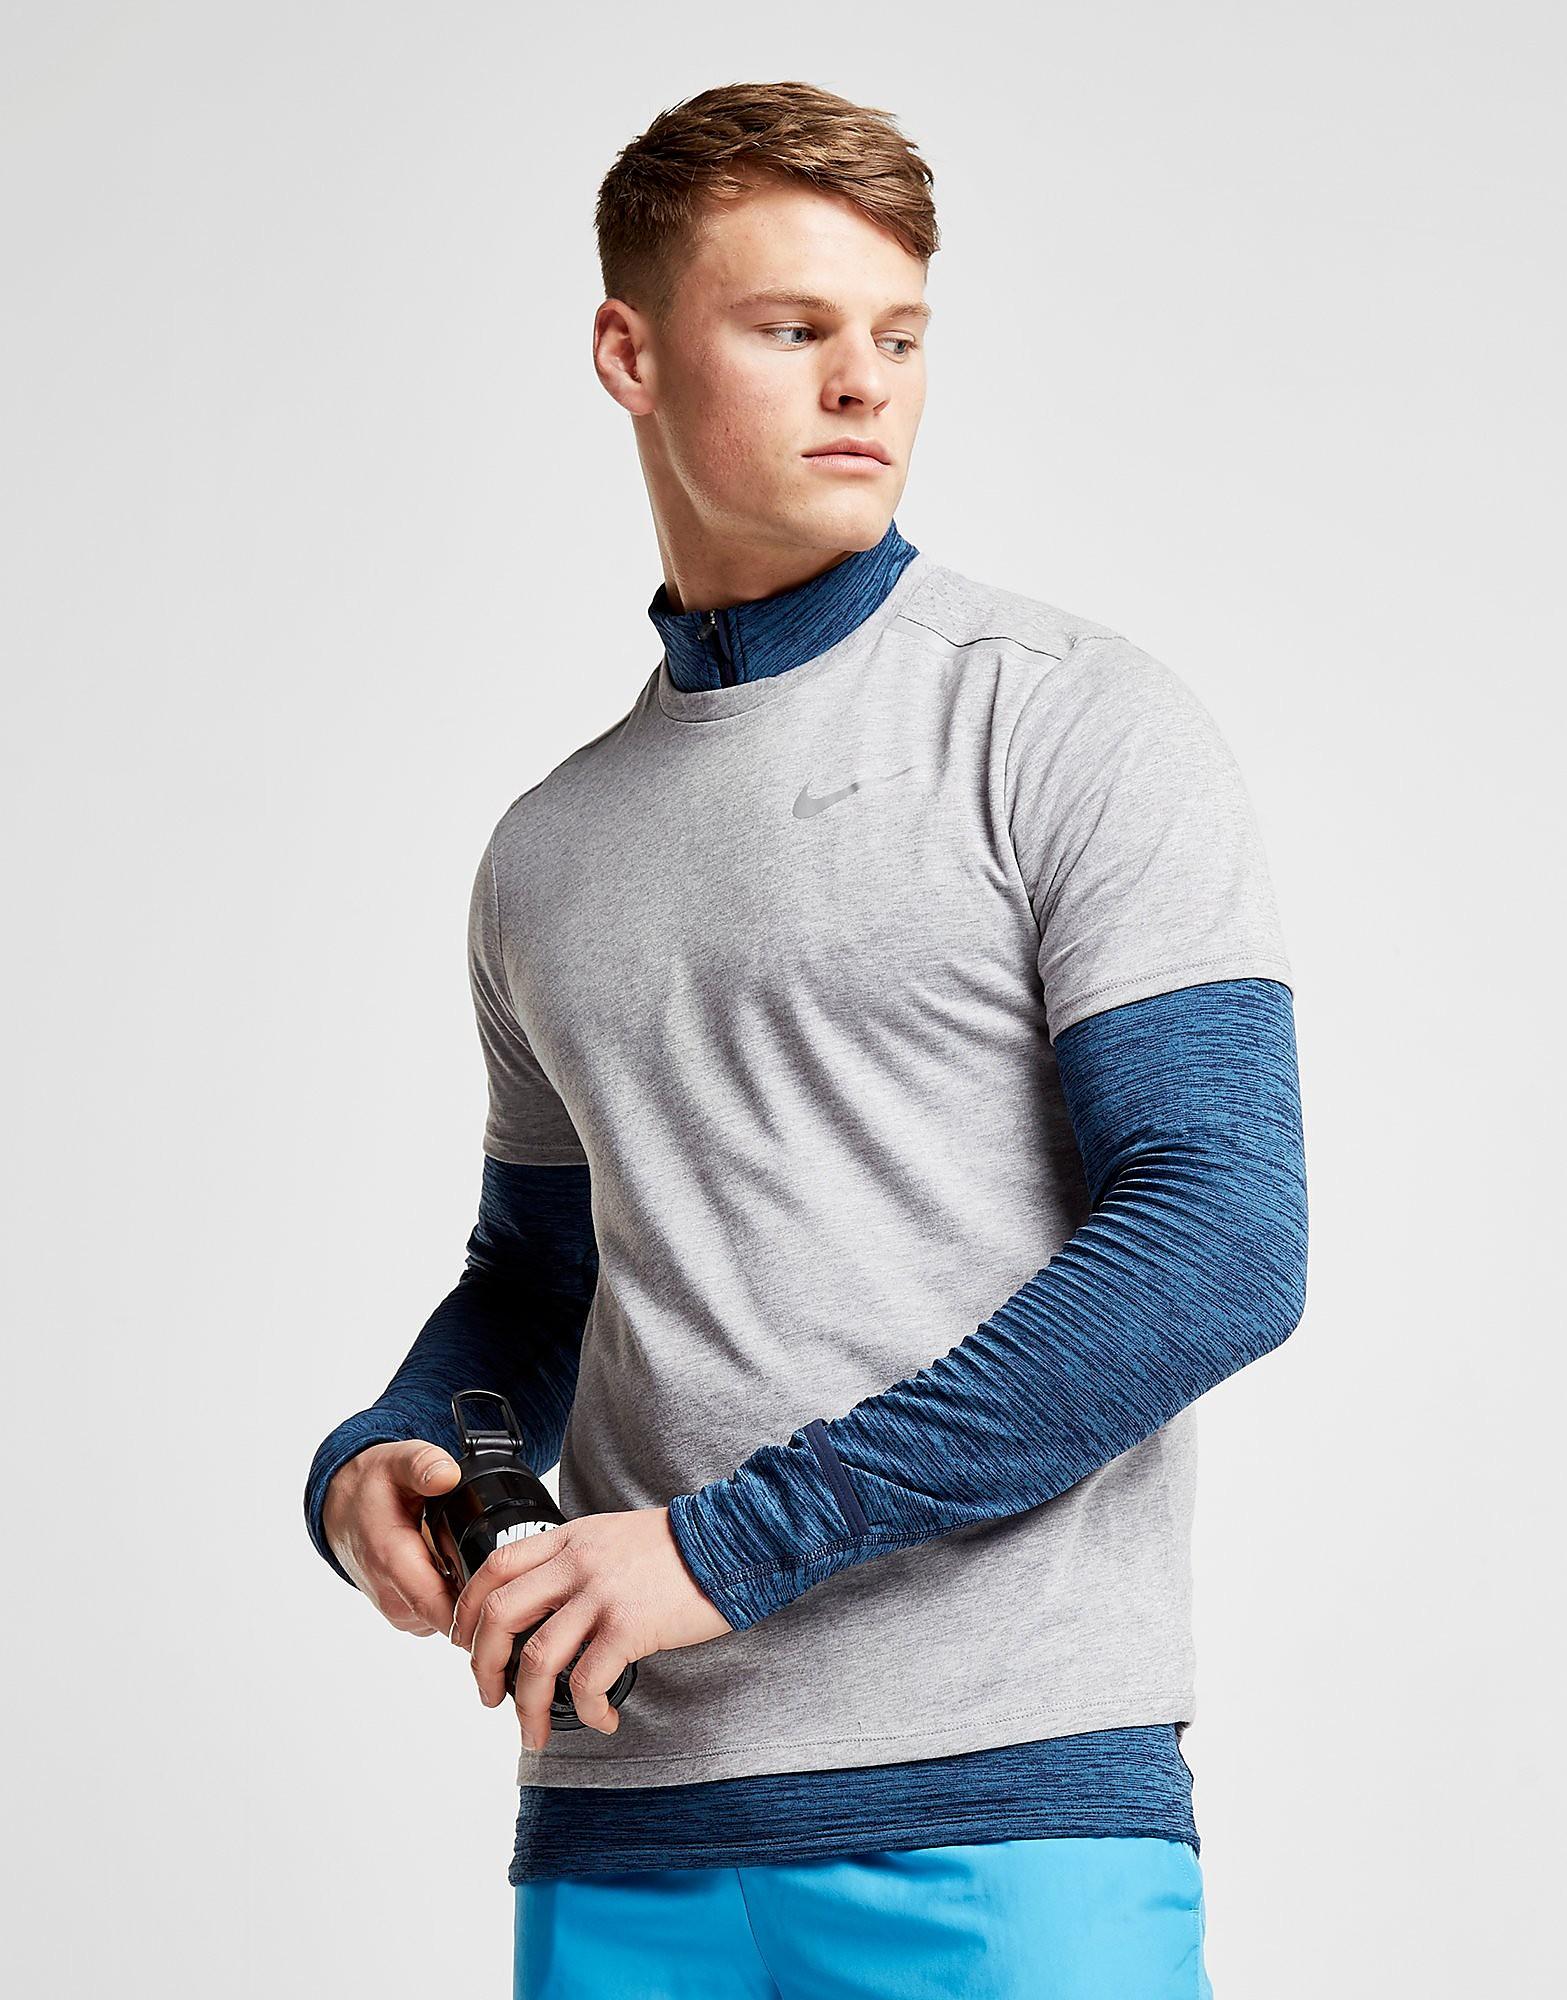 Nike Breathe Rise Short Sleeve T-Shirt